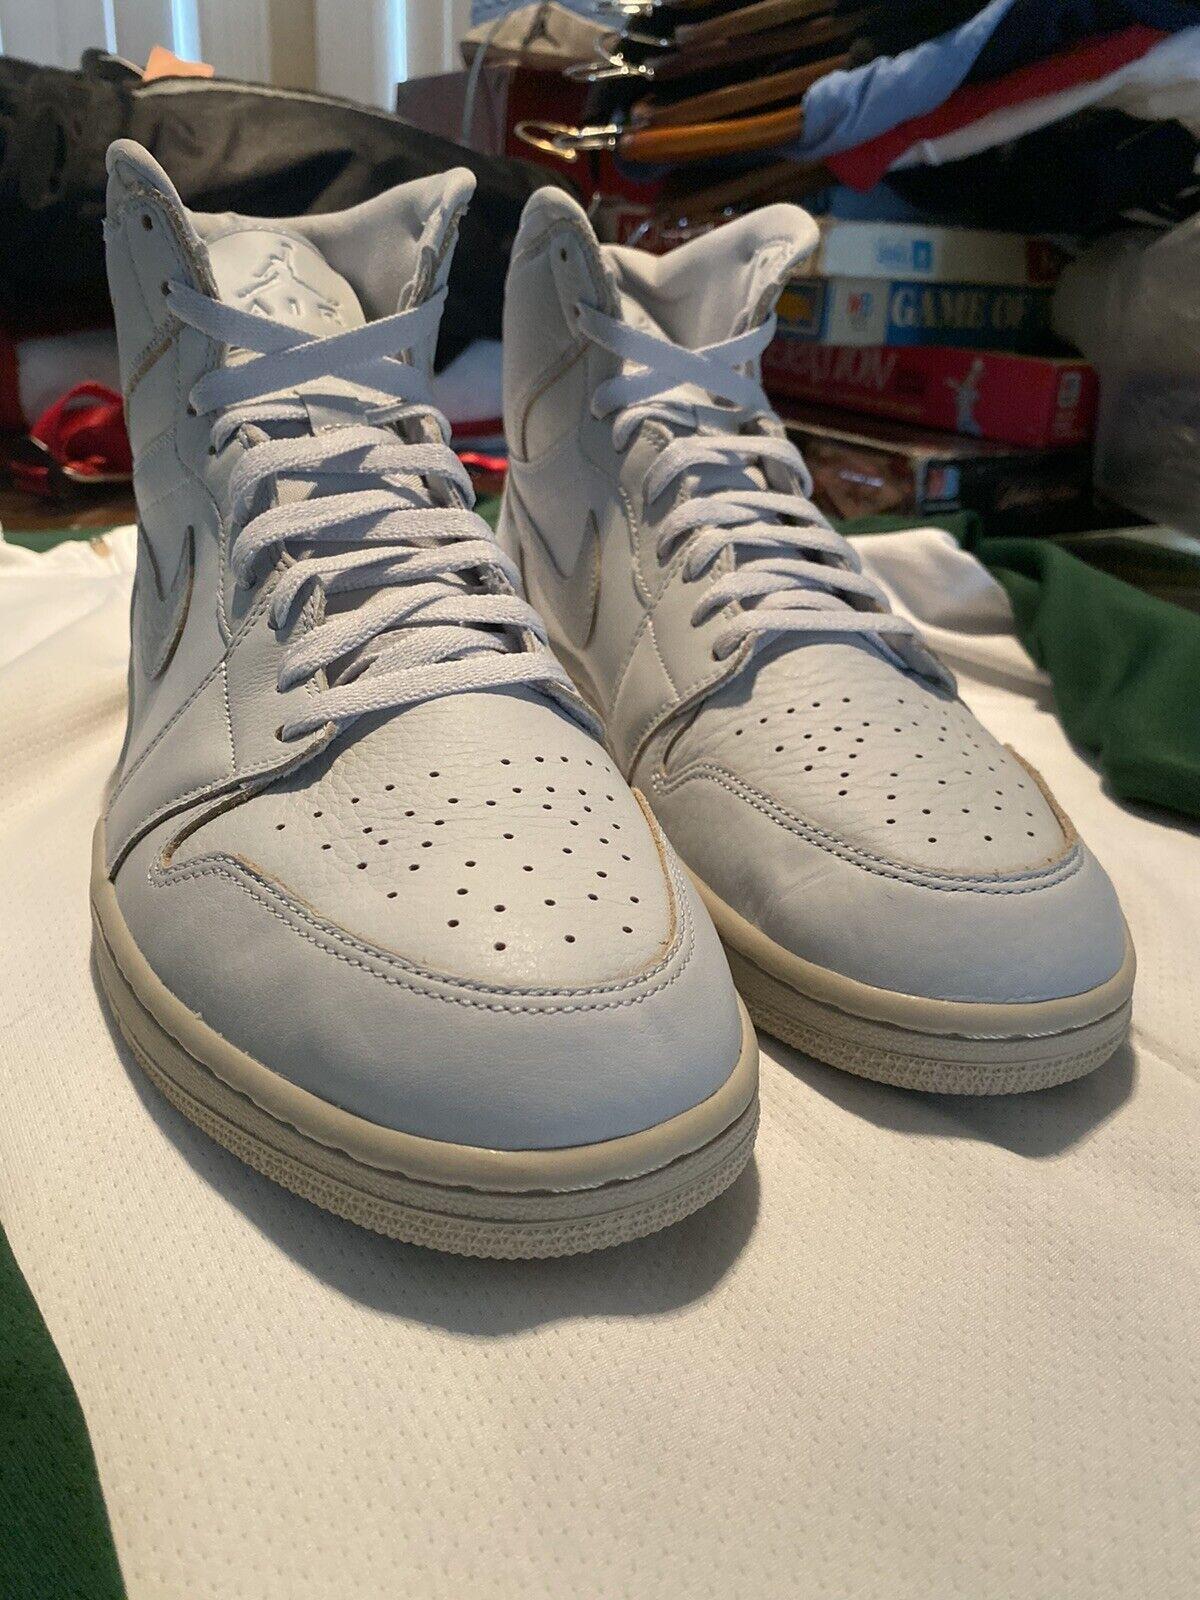 Nike Air Jordan 1 Retro High PRM Pure